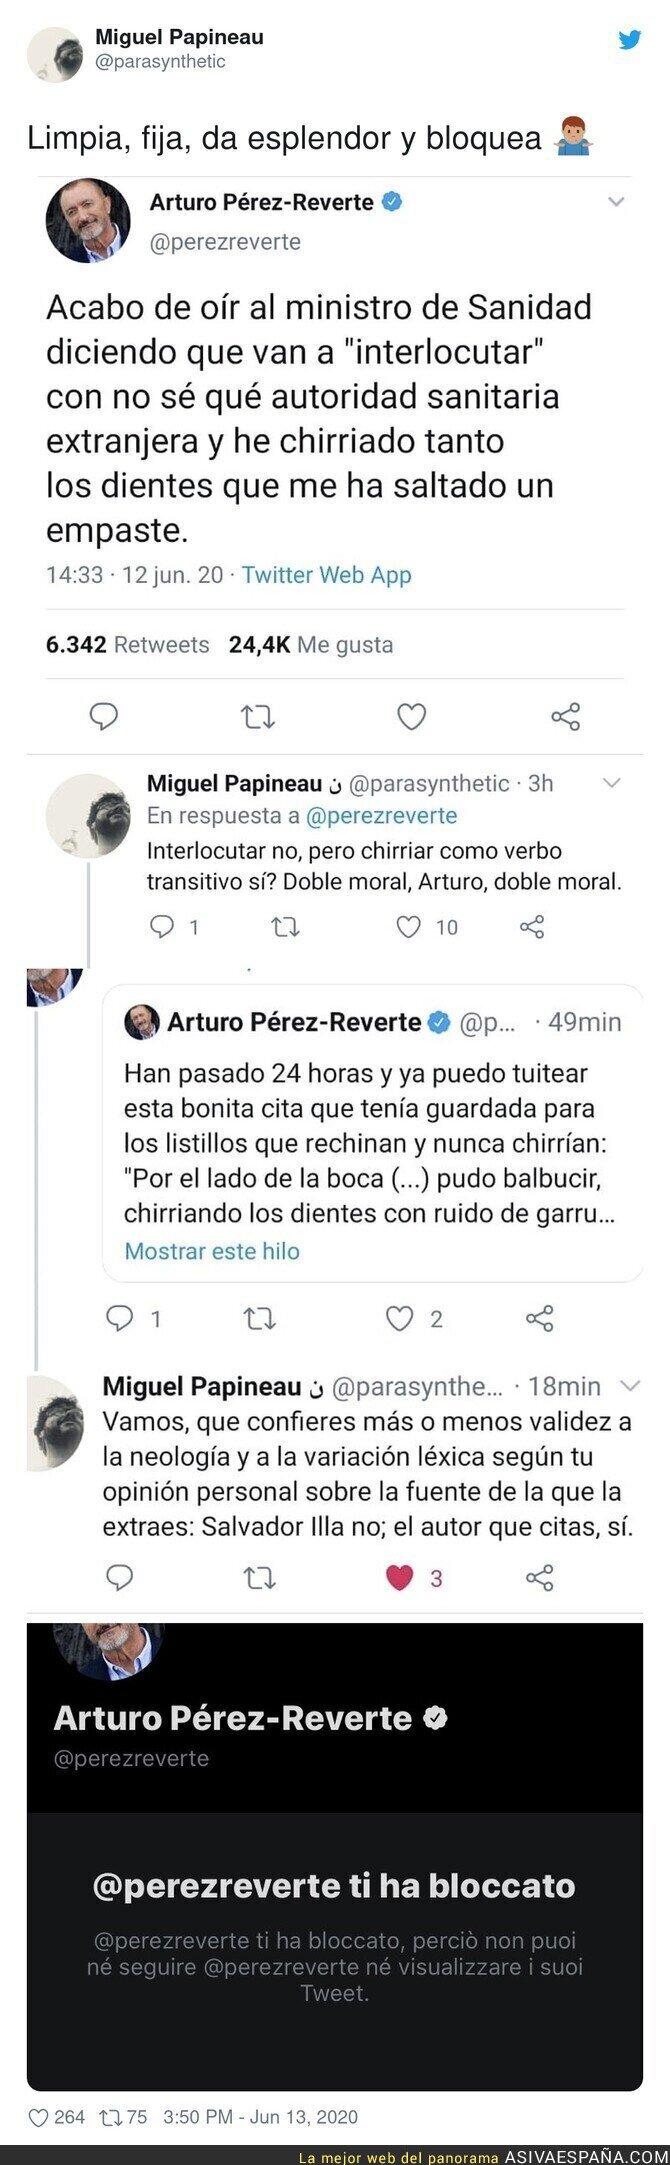 222076 - A Artúro Pérez-Reverte no le gusta que le digan las verdades a la cara